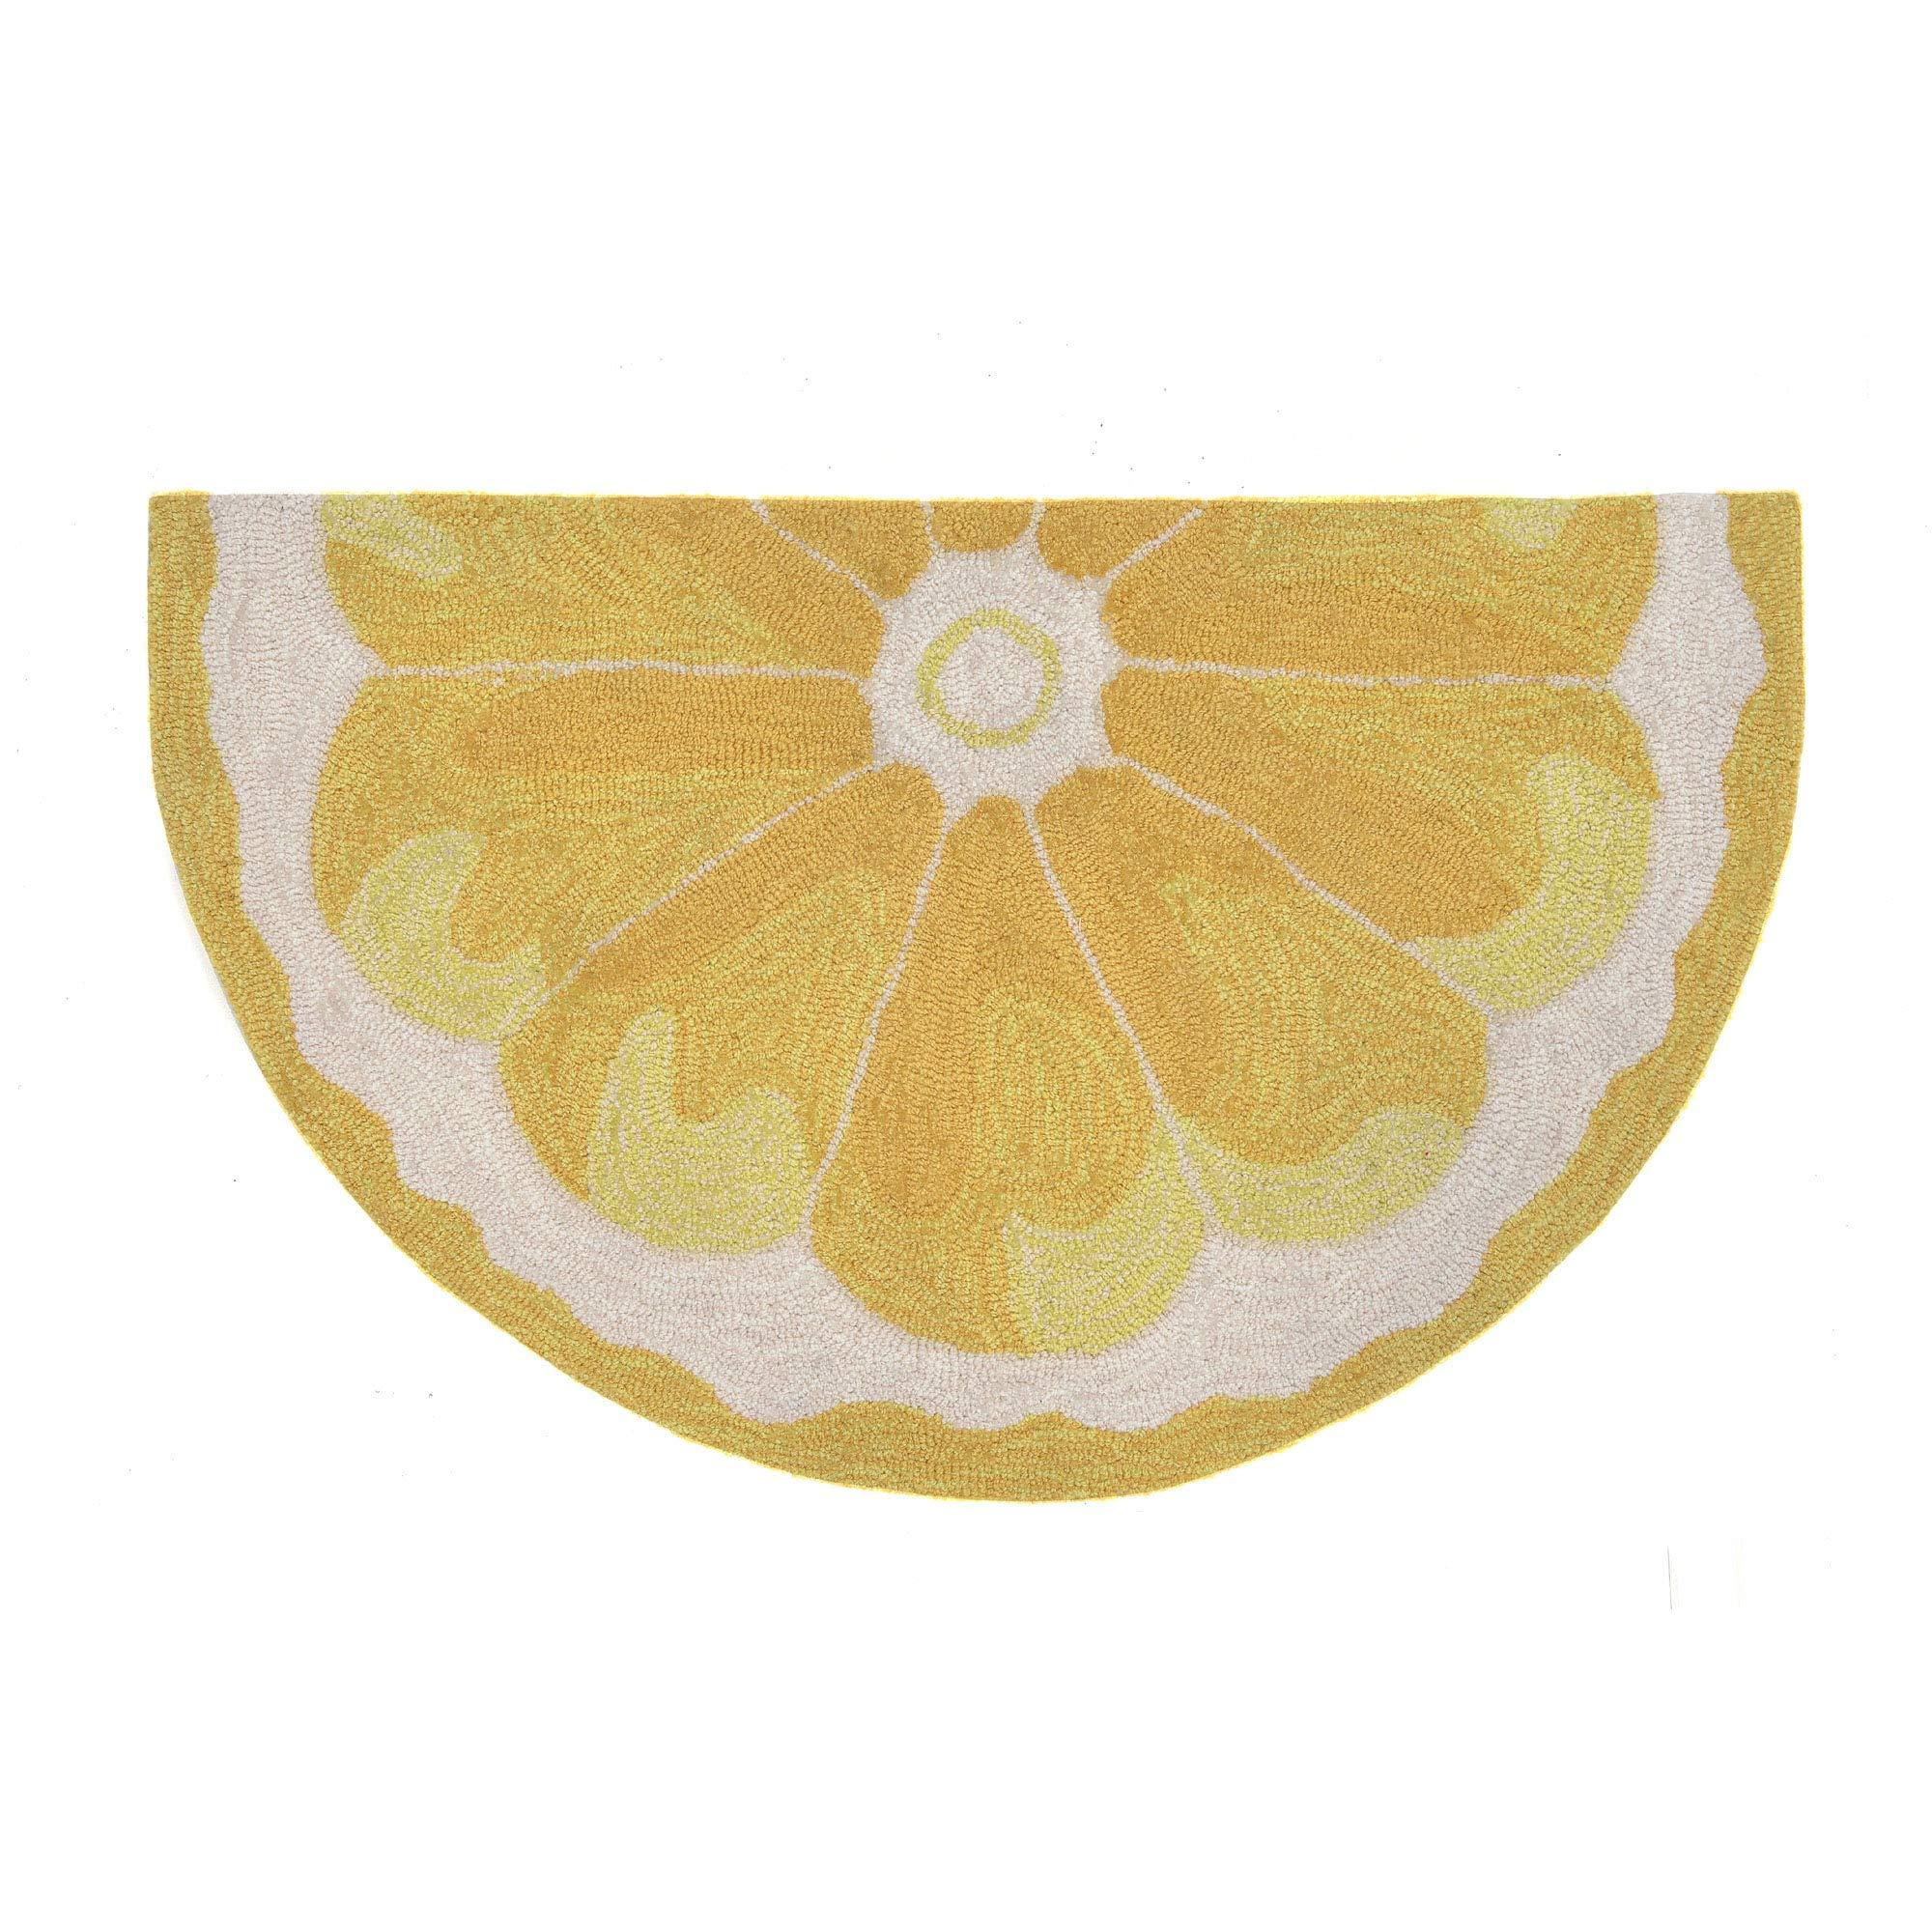 Liora Manne FTPH2155609 Frontporch Front Porch Kitchen Fruit Lemon Slice Yellow Indoor/Outdoor Circle Half Round Rug, 2' X 3'' 1/2 RD, Gold and White